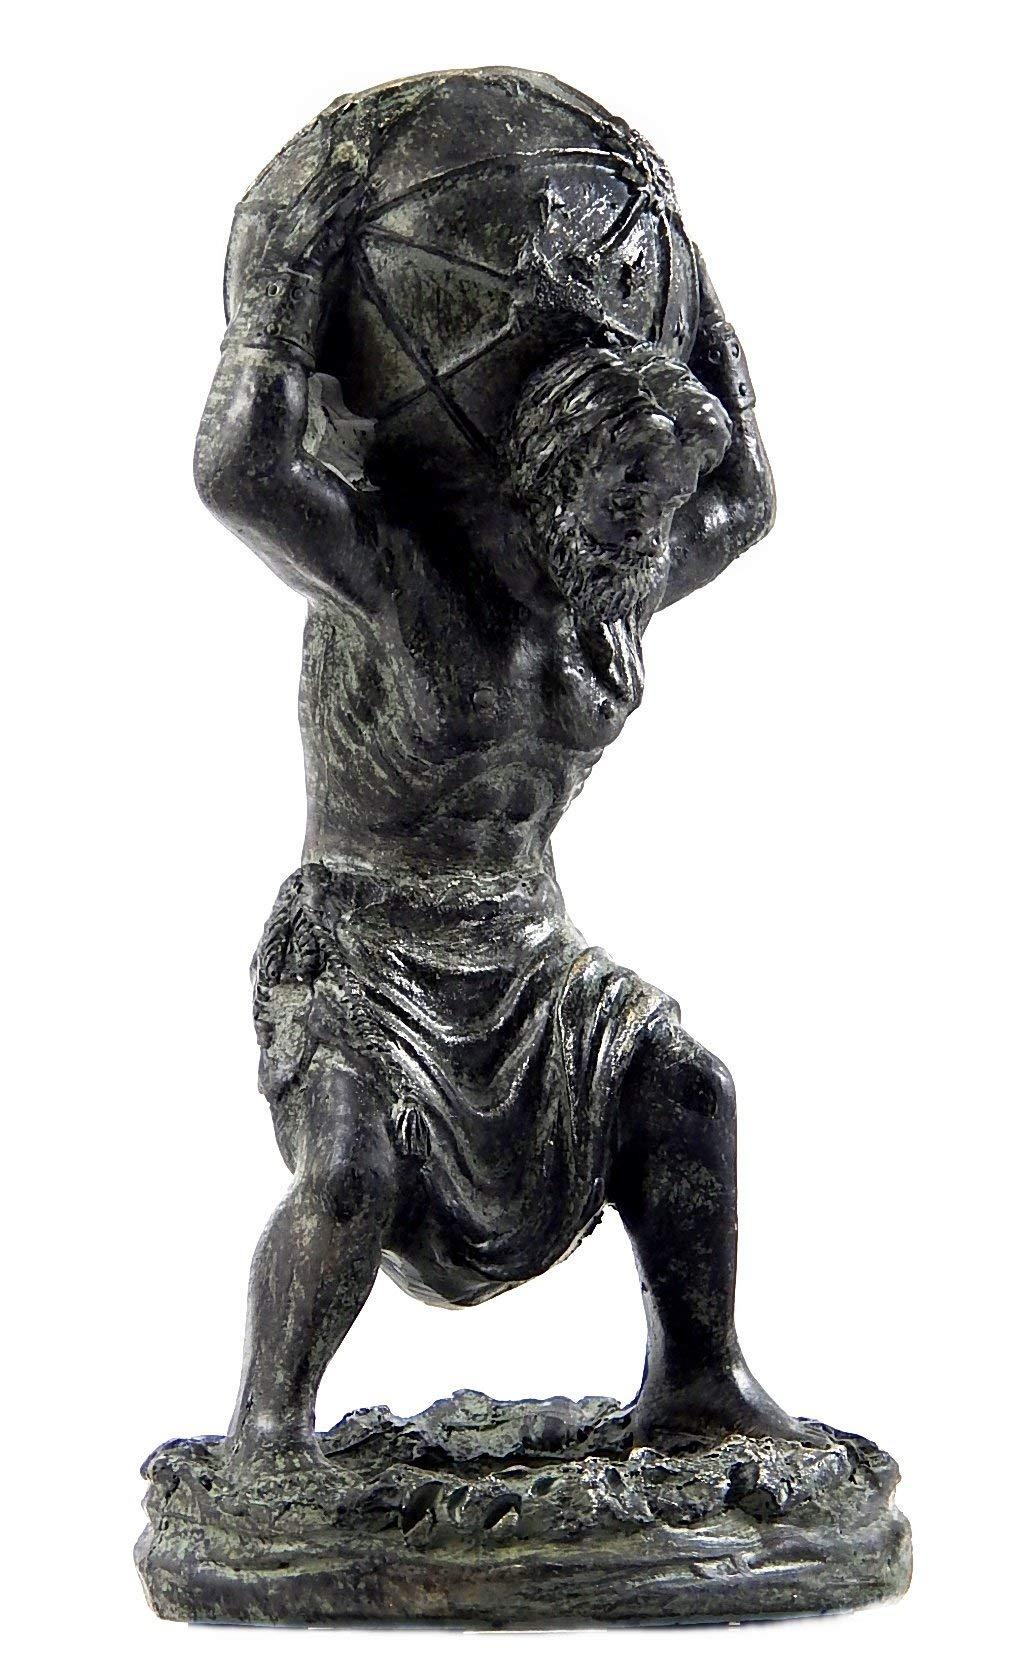 Bellaa 22692 Atlas Holding World Greek Statue Roman Mythology 6 inch